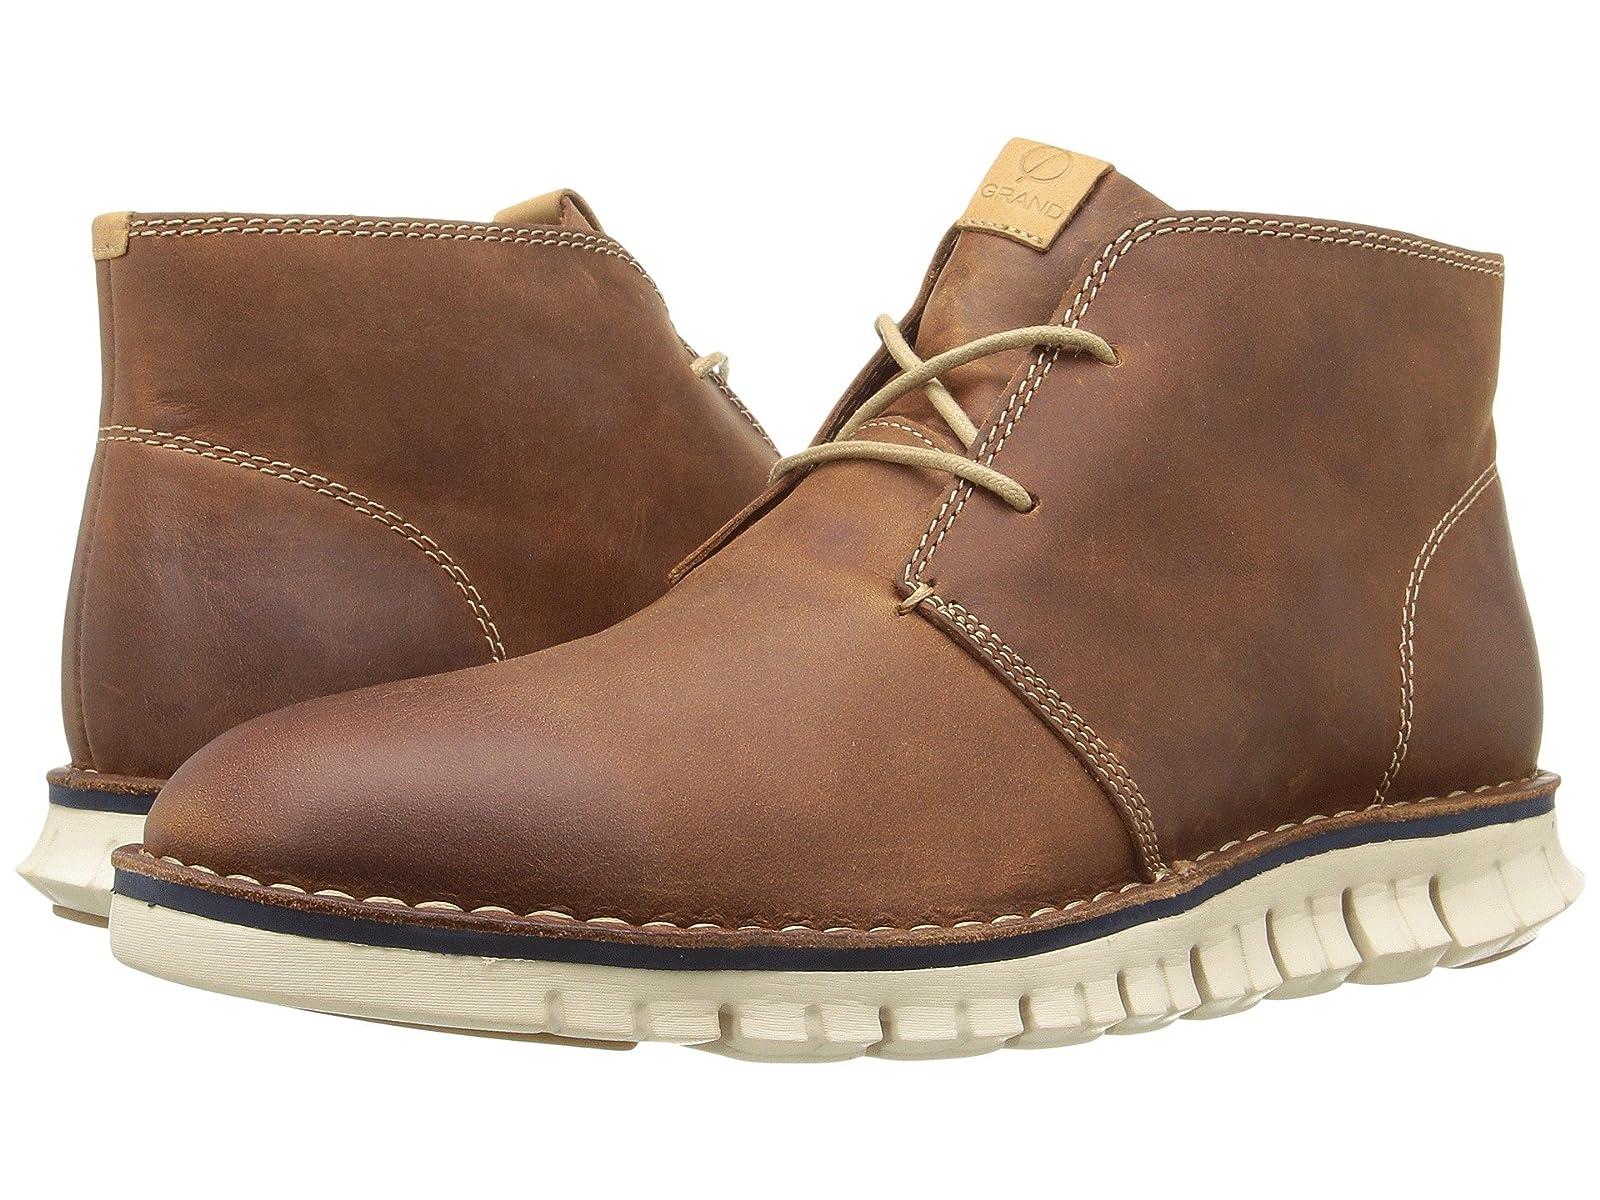 Cole Haan Zerogrand Stitchout ChukkaCheap and distinctive eye-catching shoes